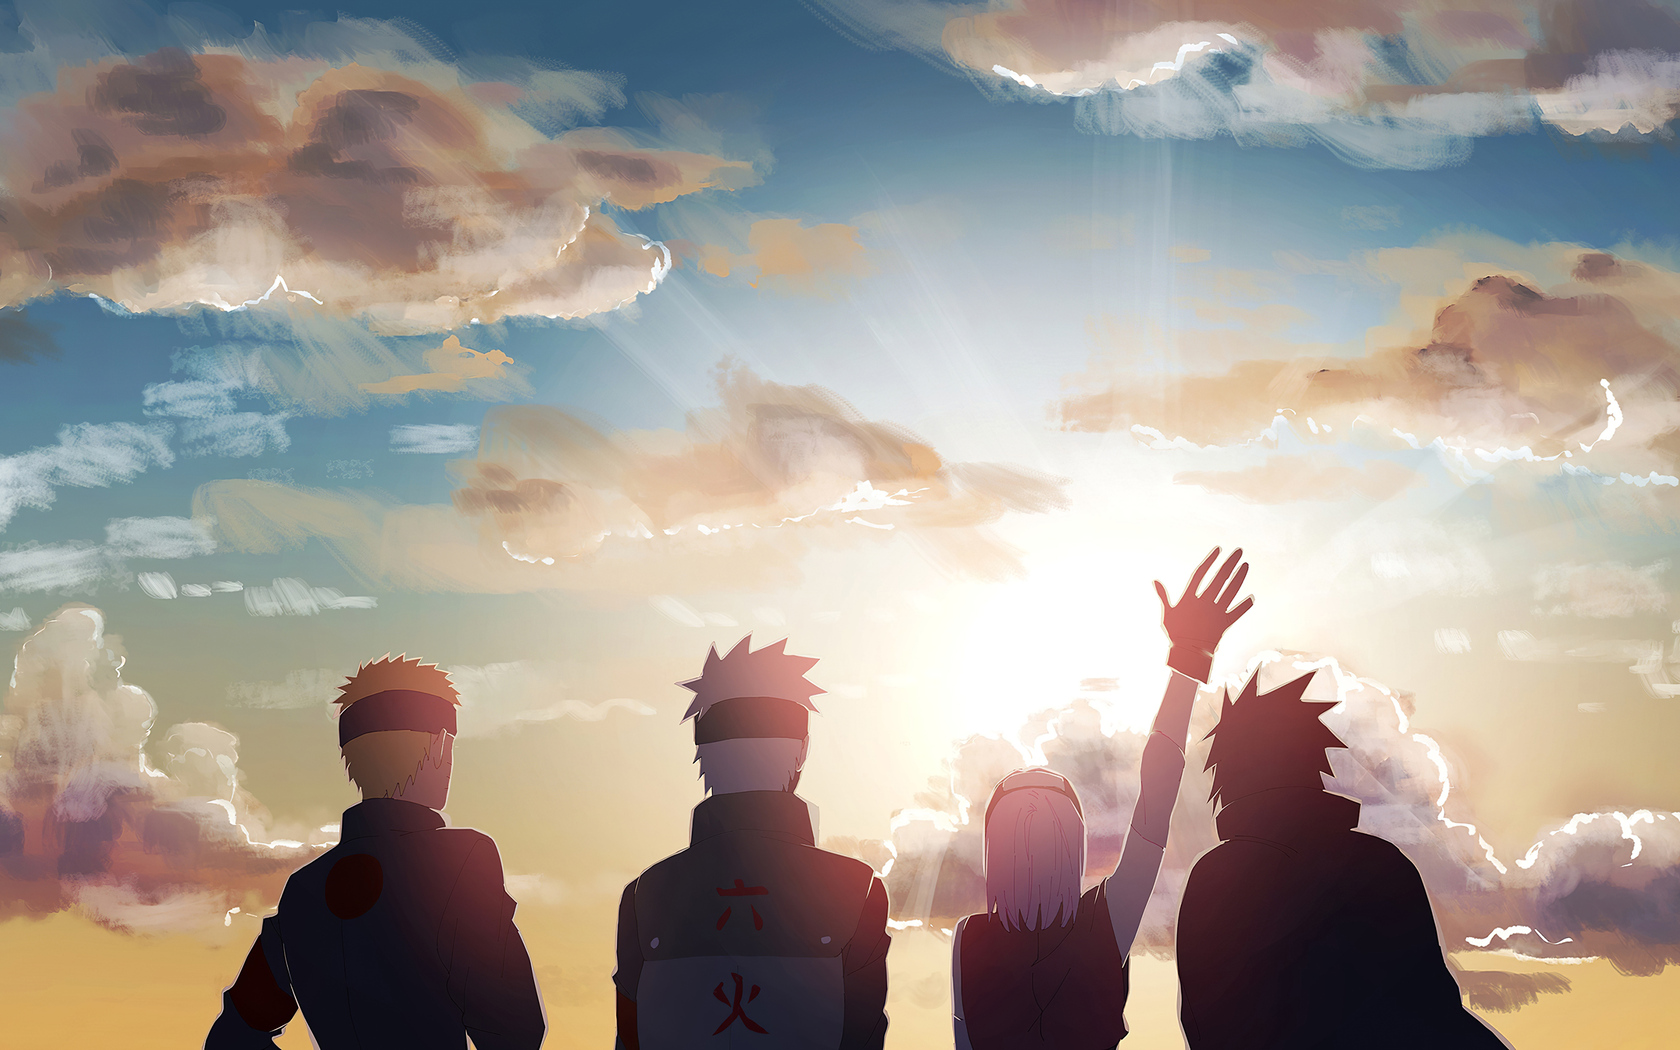 1680x1050 Naruto Anime Art 4k 1680x1050 Resolution HD 4k ...